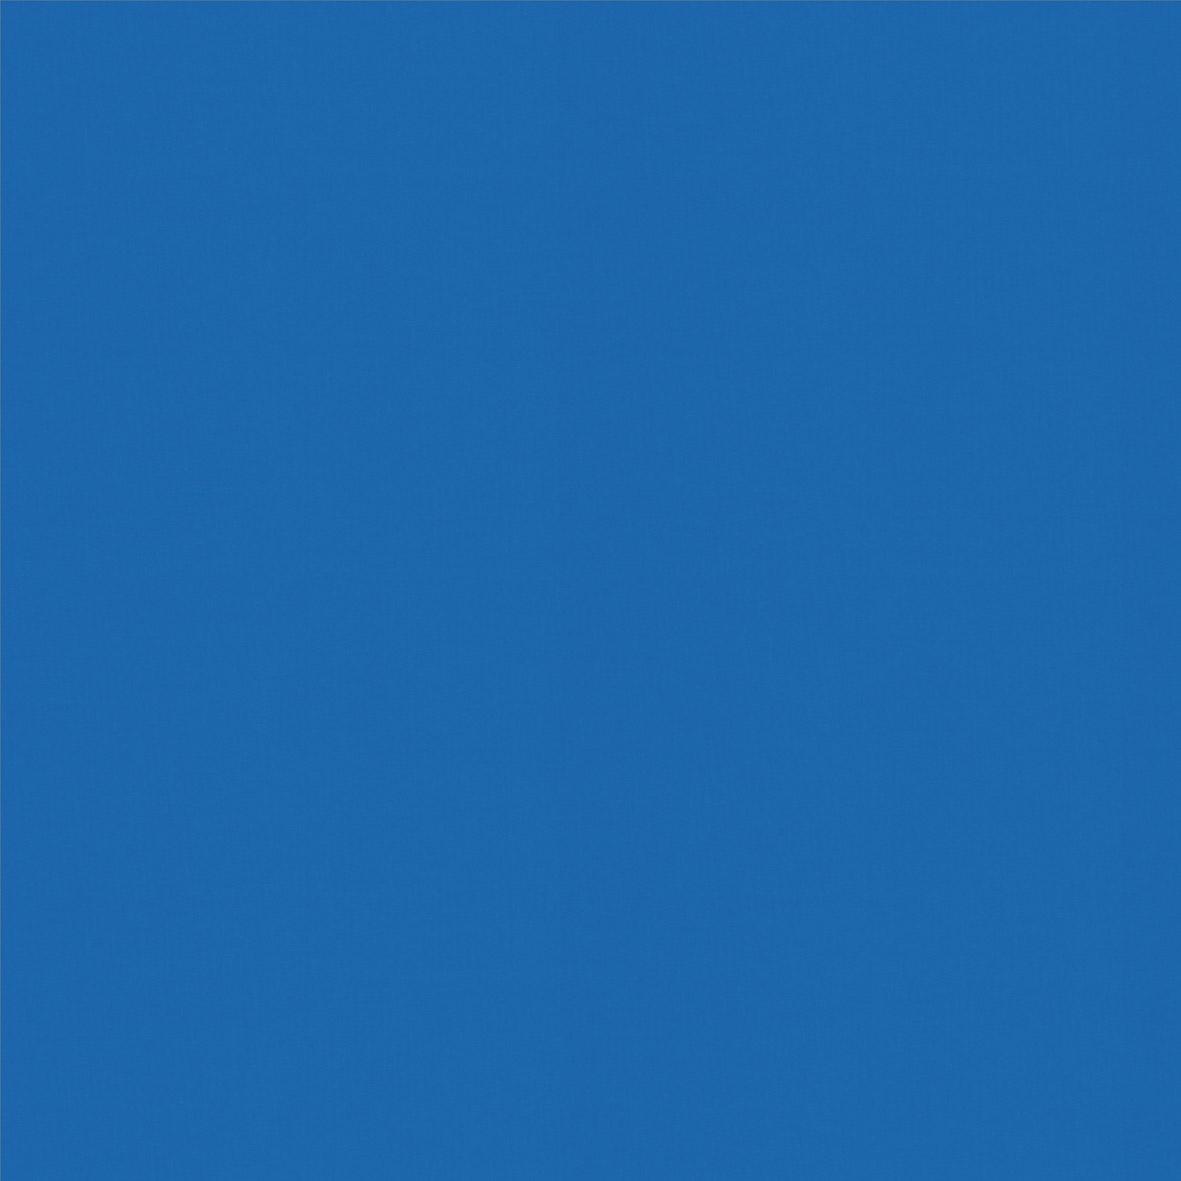 Roller_Swatch_Banlight_Duo_FR_Blue_RE0314